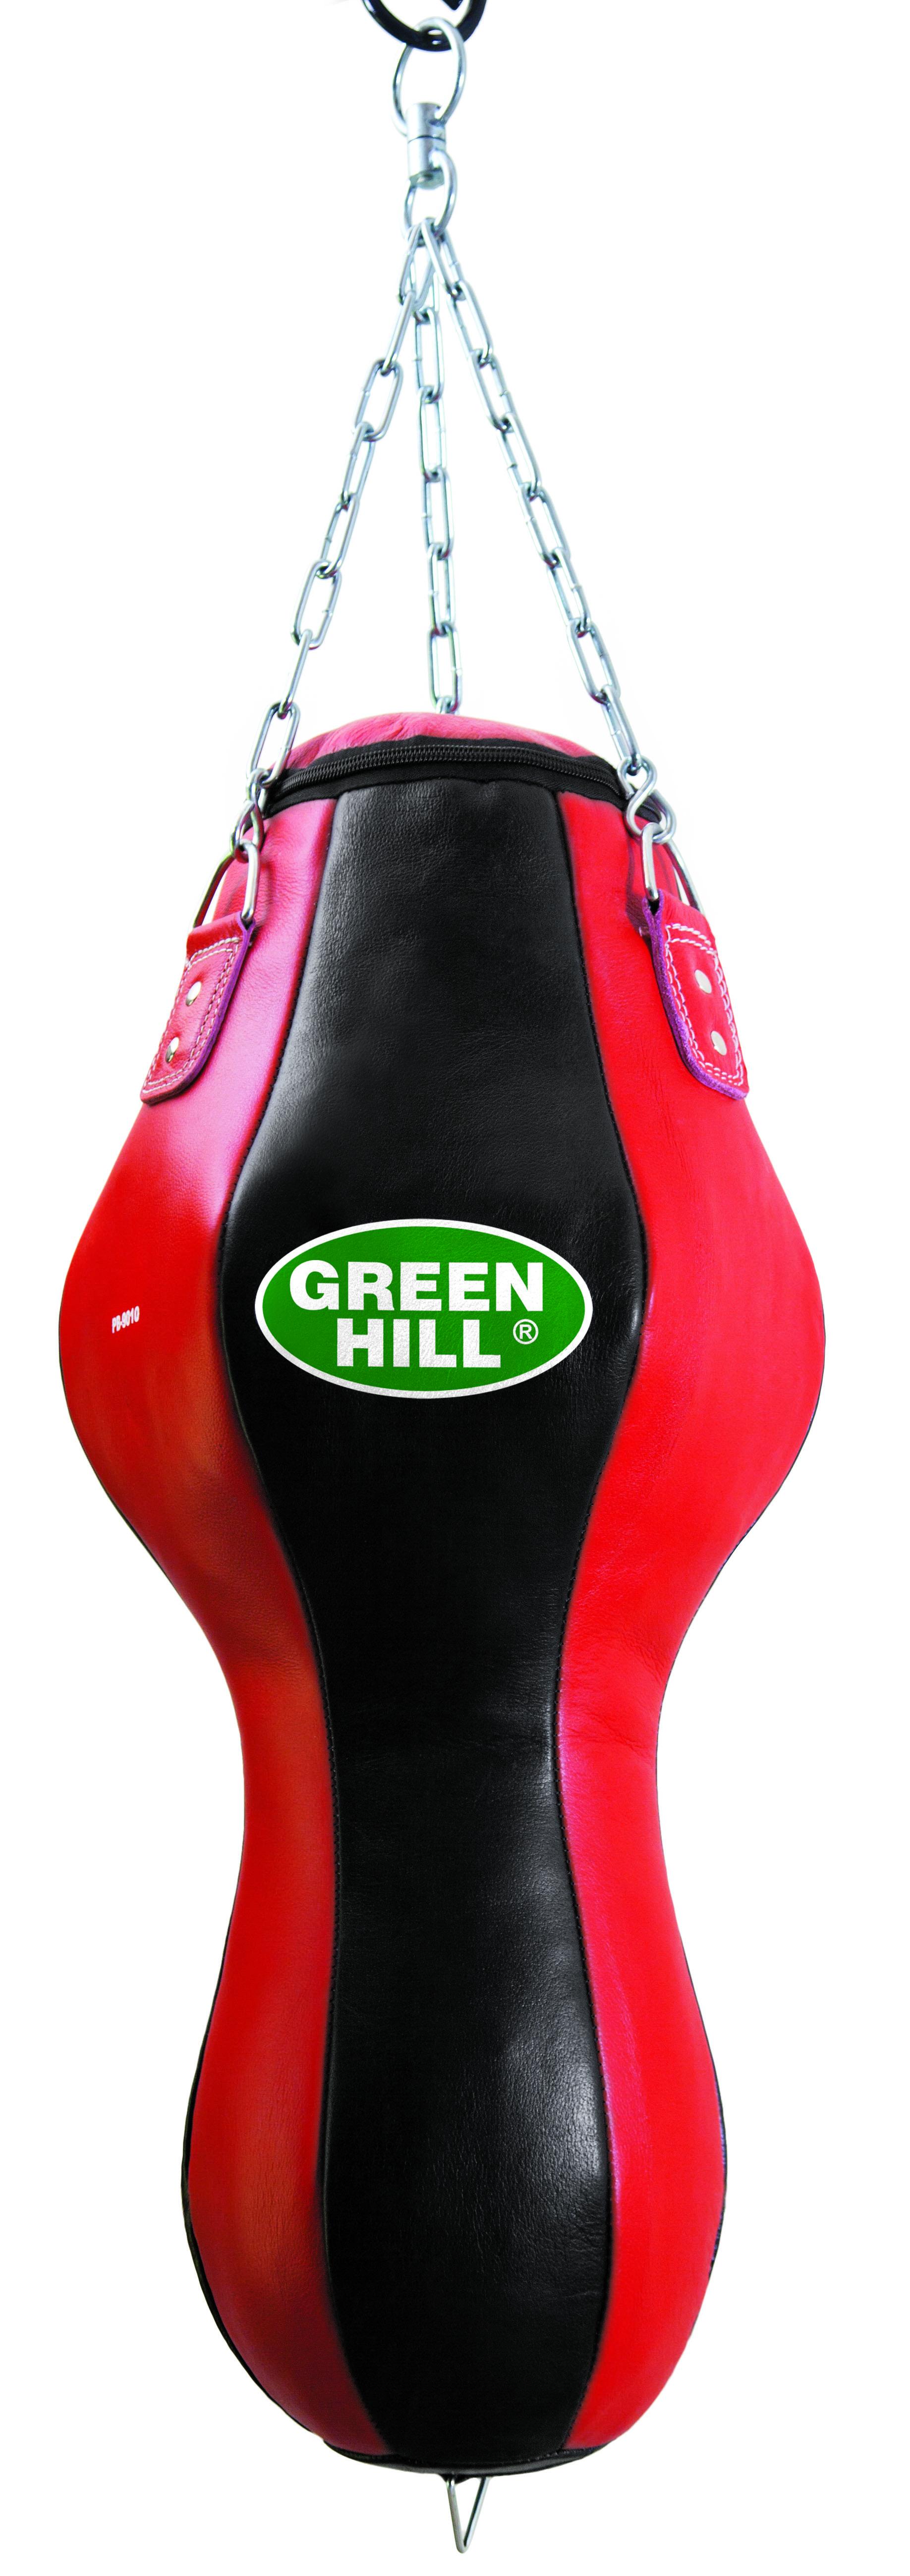 Green Hill Мешок набивной фигурный Green Hill, 38 кг green hill ракетка для тхэквондо green hill double